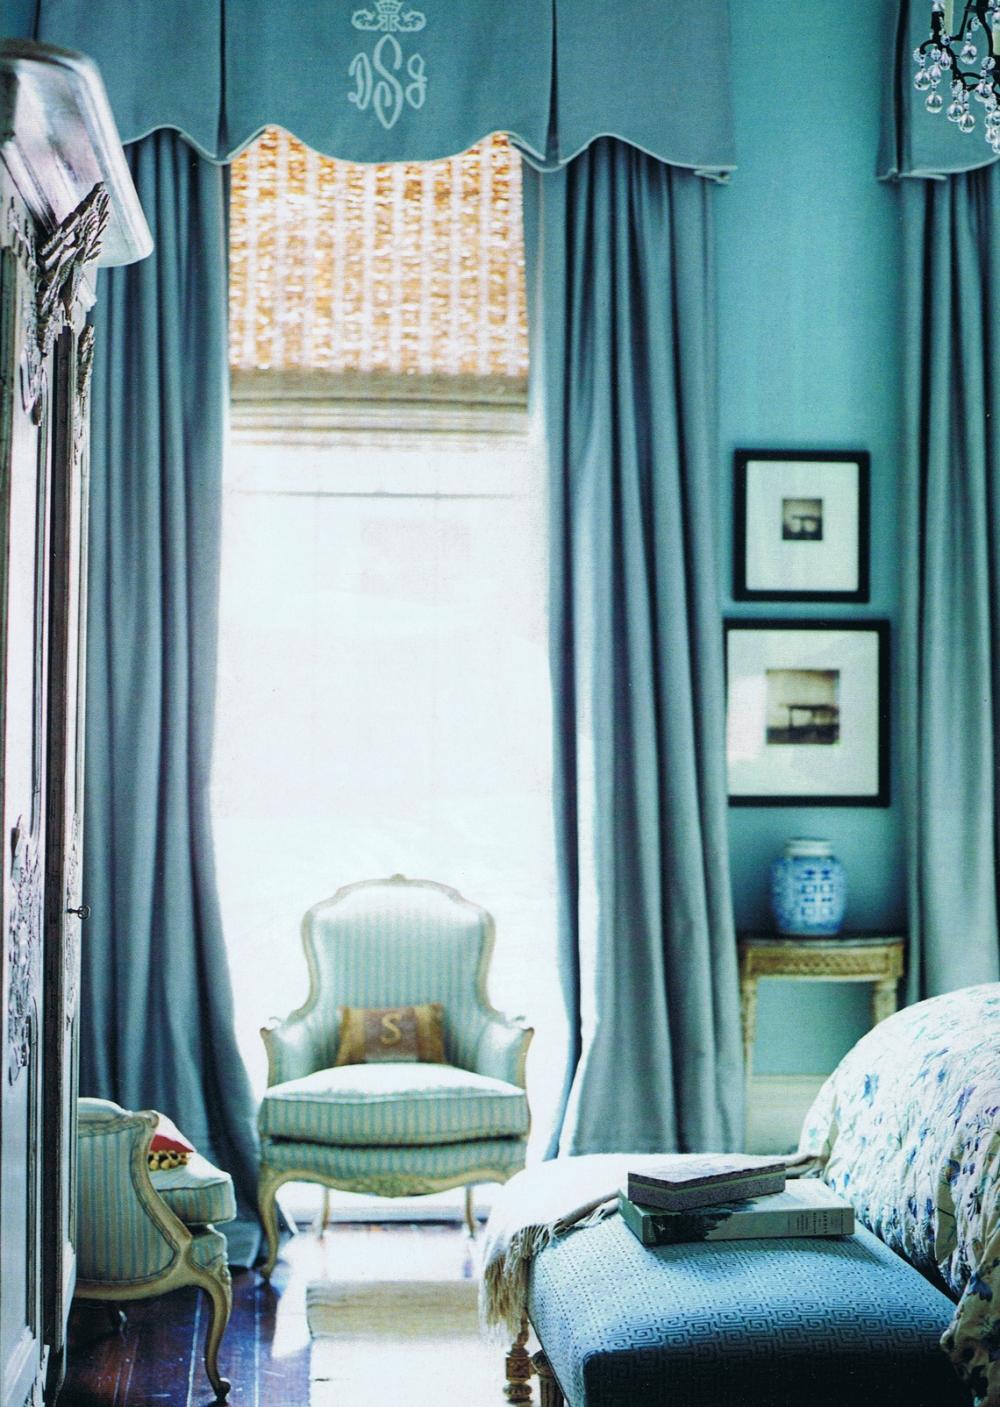 House Beautiful '08 Debra Shriver